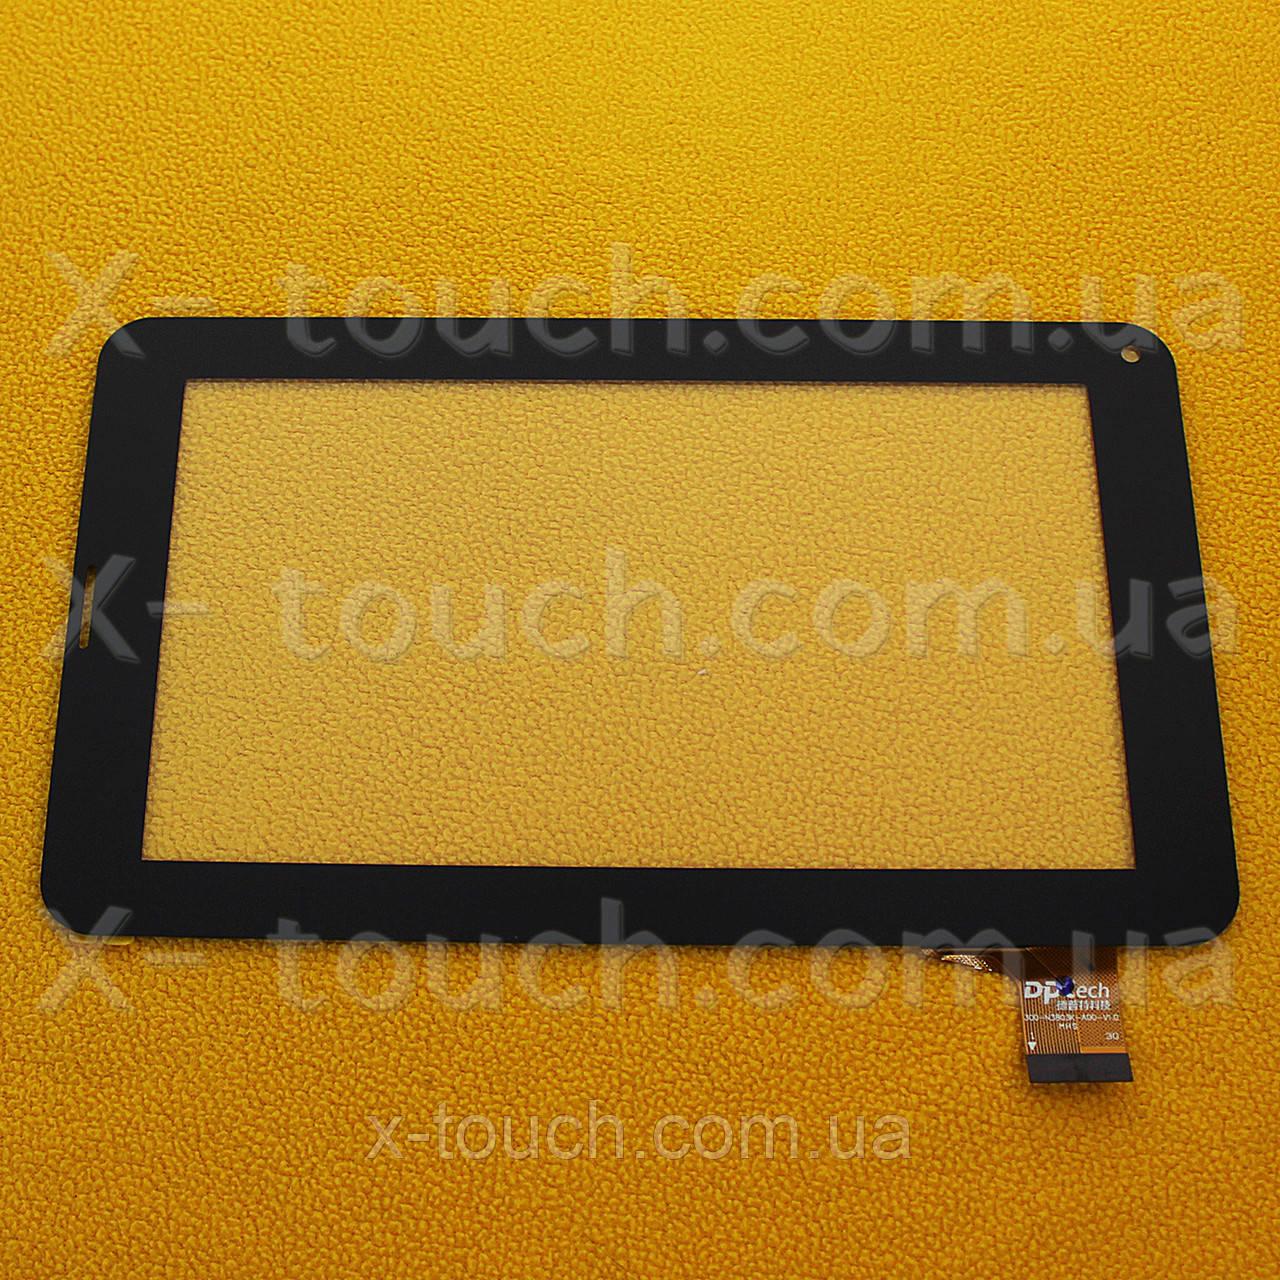 Тачскрин, сенсор  F0298 KDX  для планшета